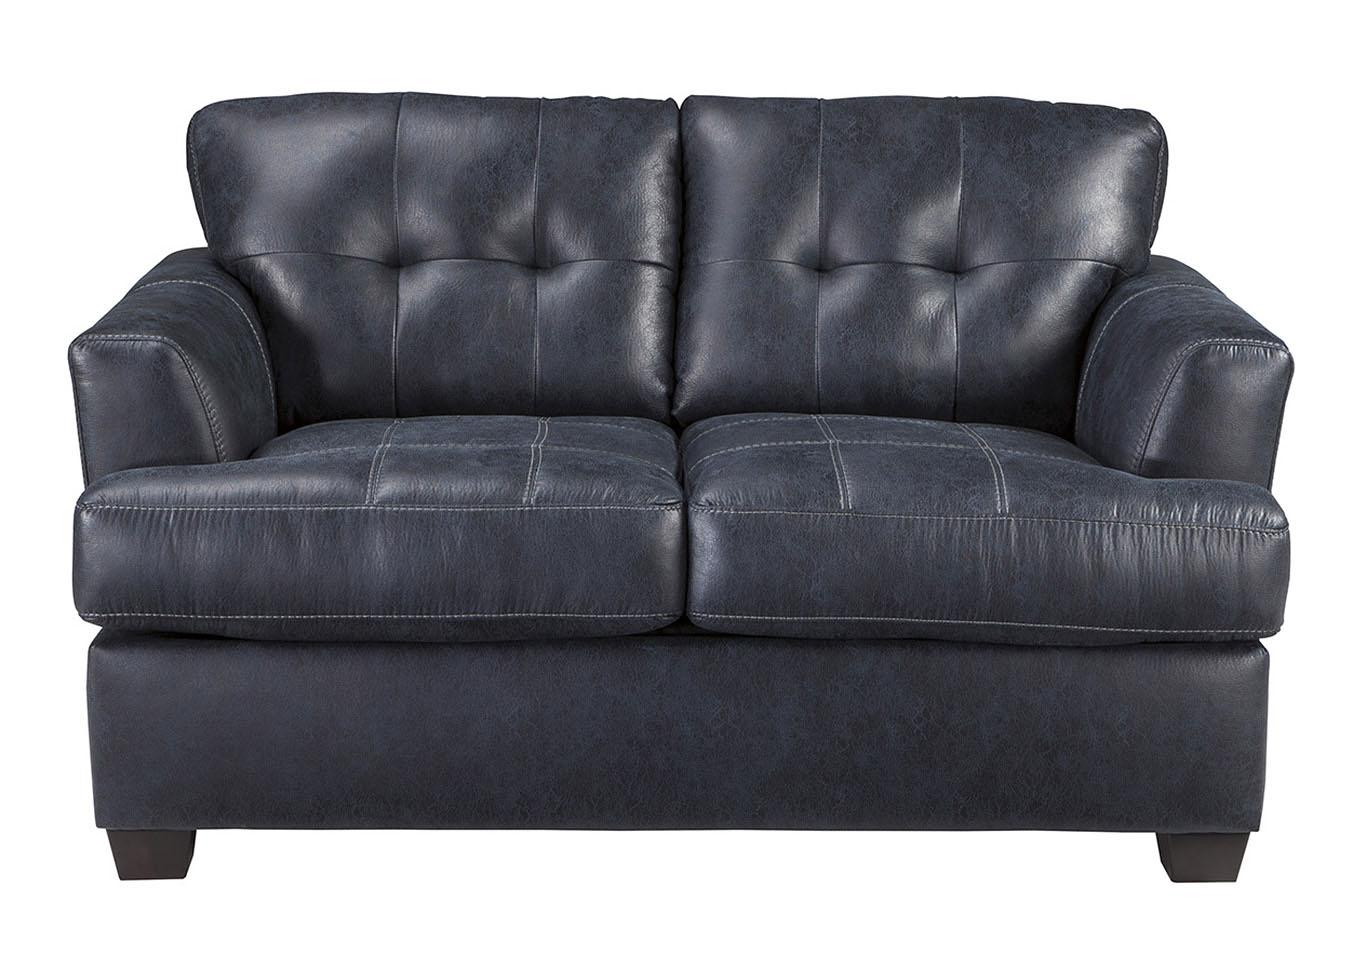 Brilliant Bargain Furniture Inmon Navy Loveseat Home Interior And Landscaping Mentranervesignezvosmurscom